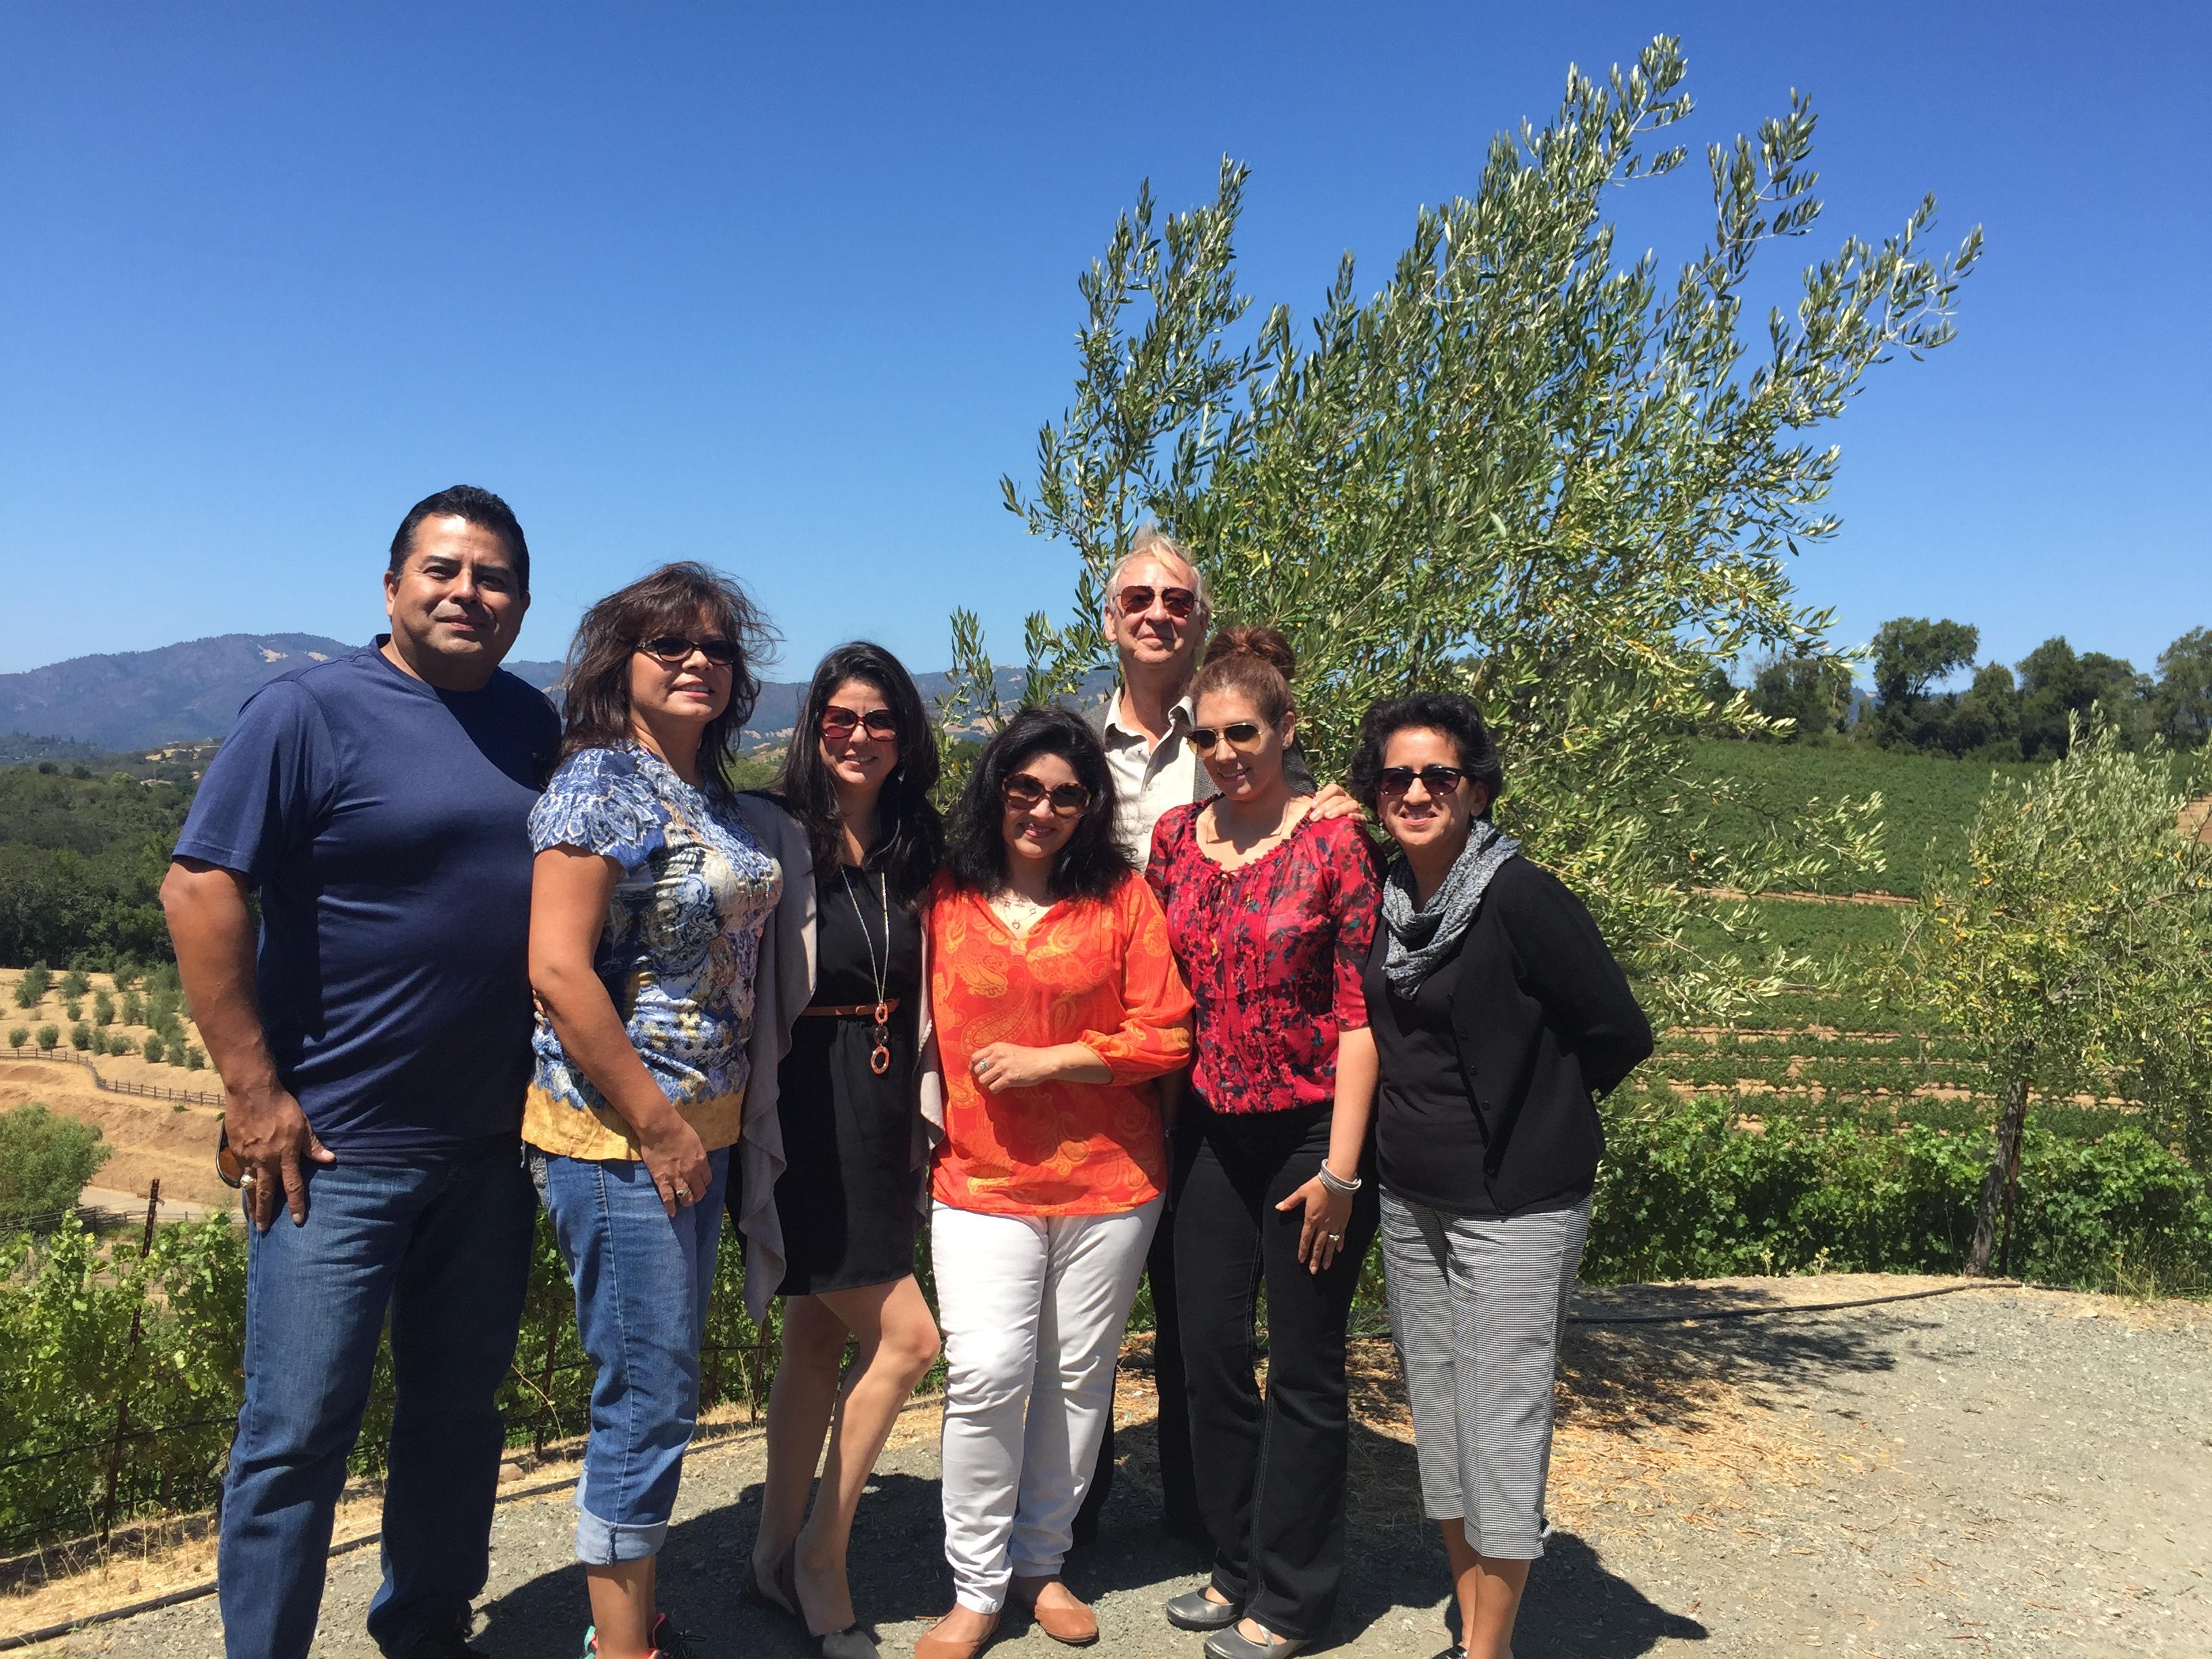 Deco Winos in Napa California Wine Tour Benziger Winery